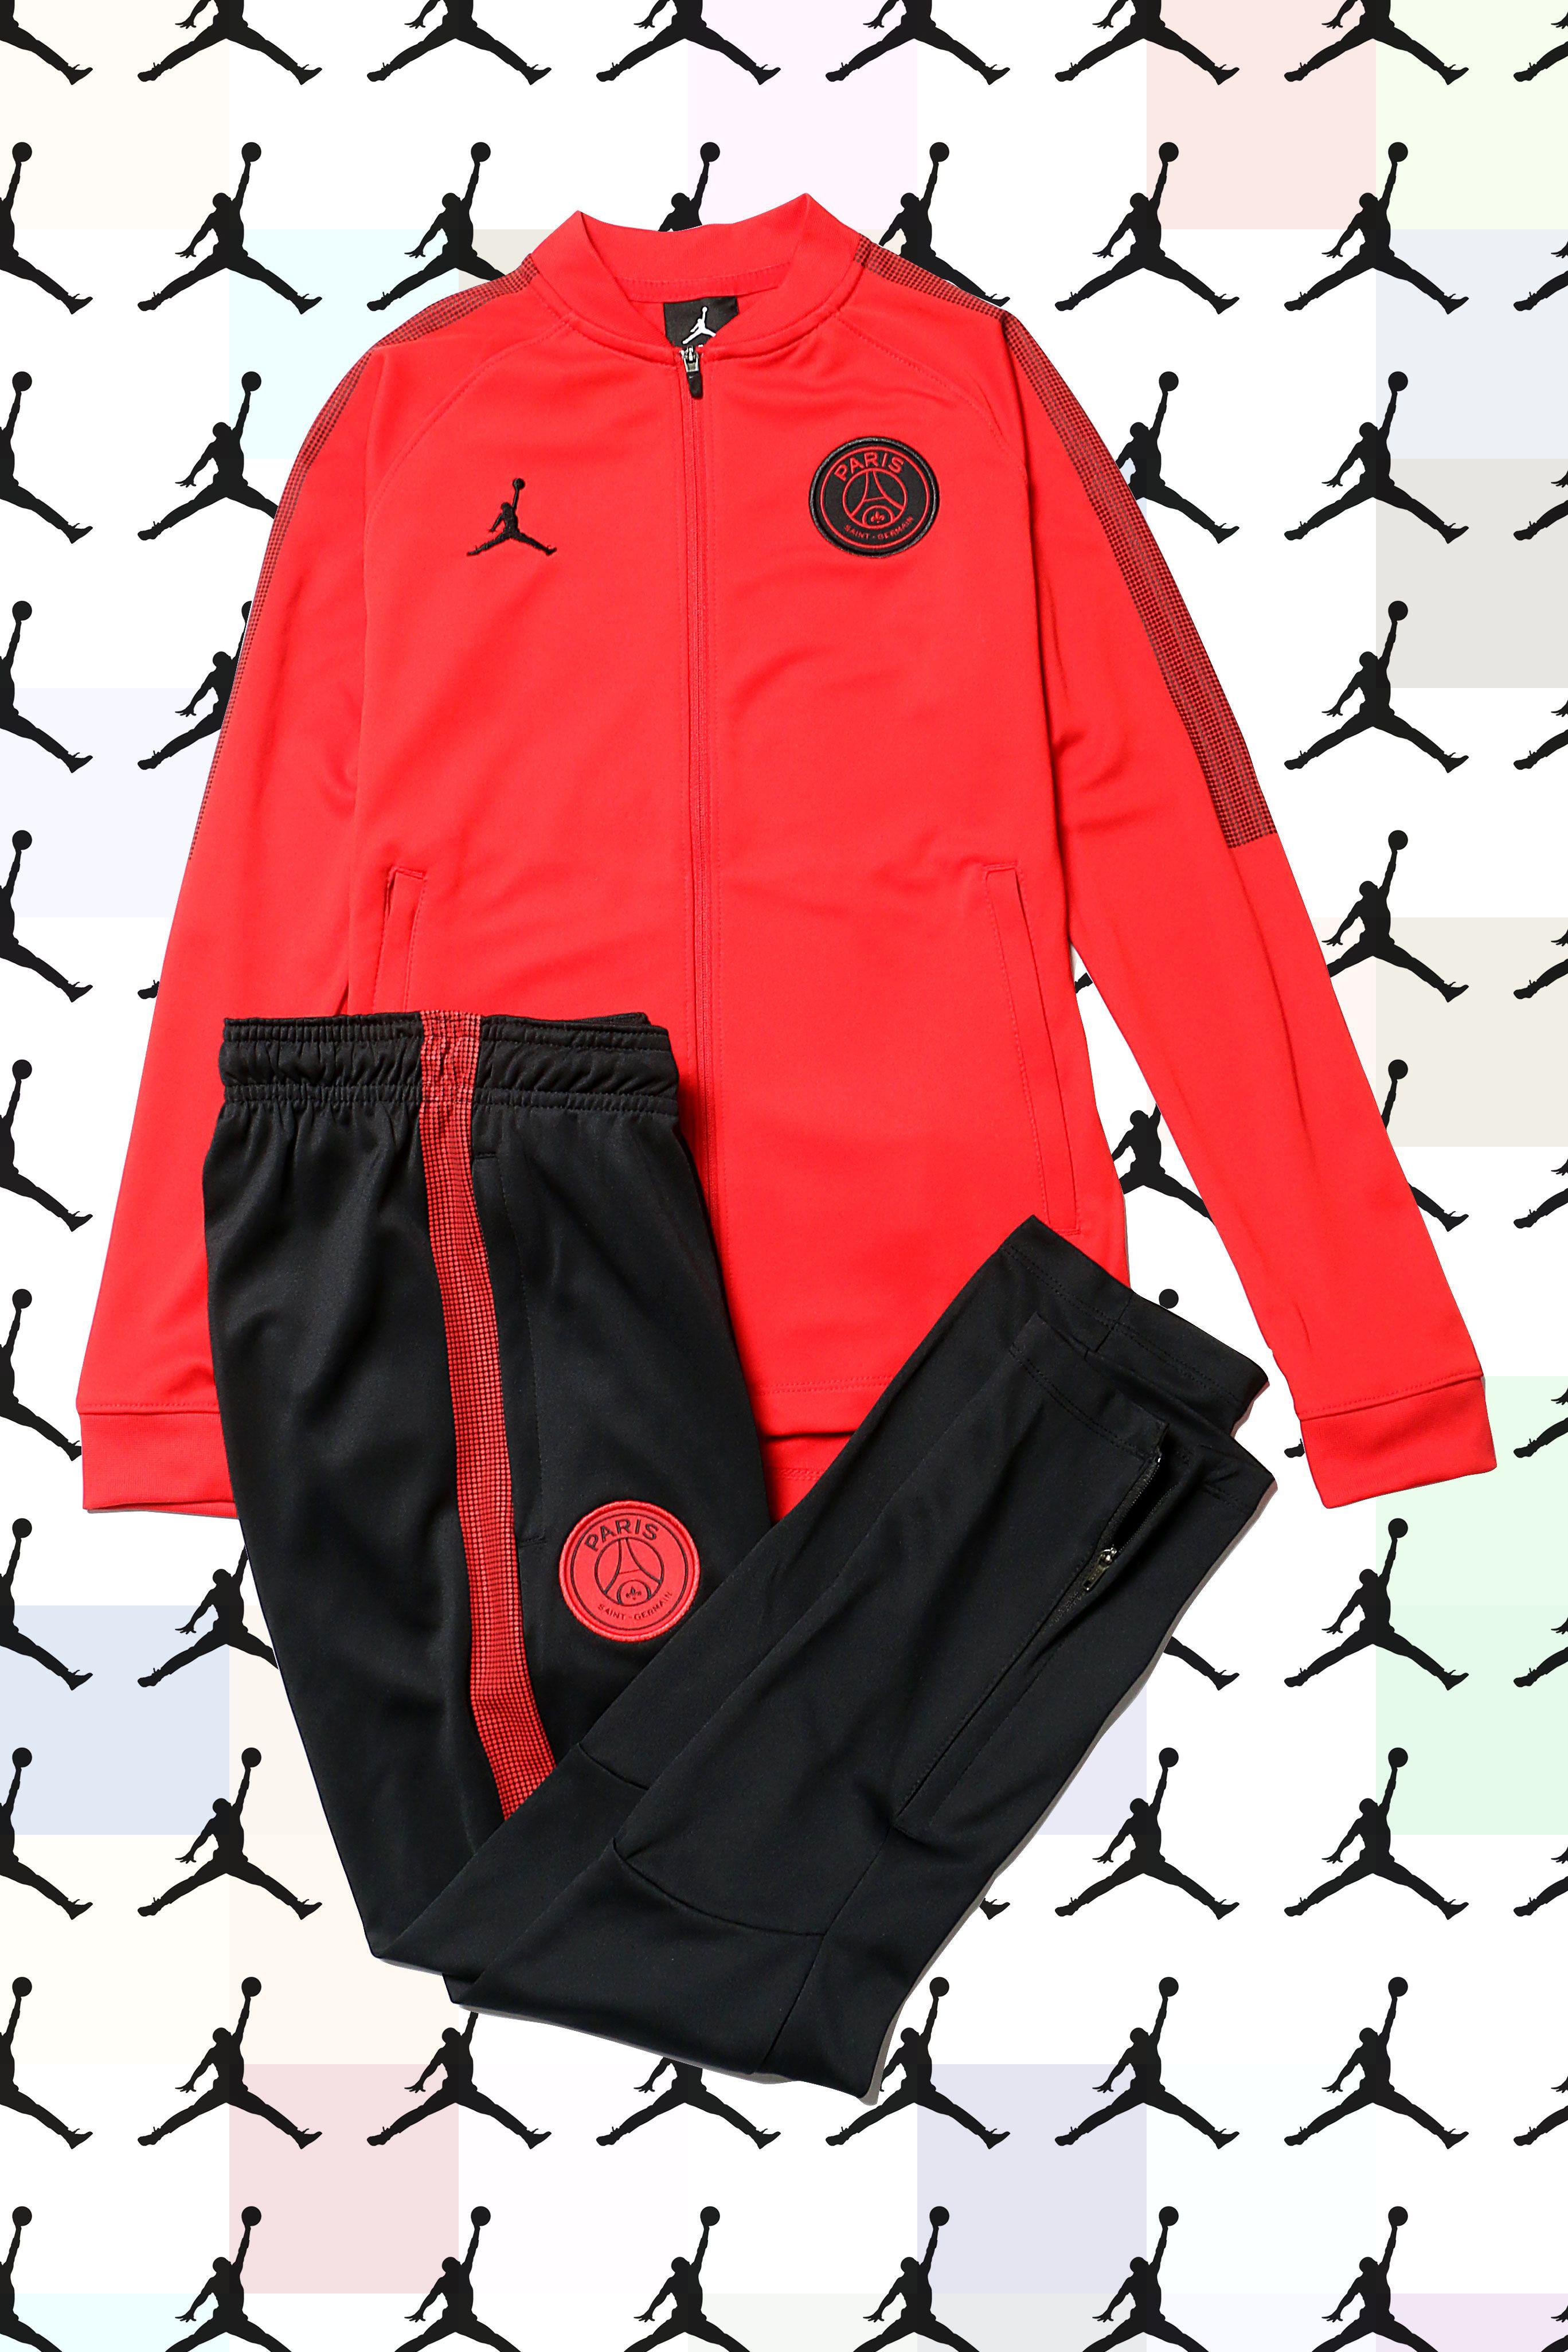 Chándal Nike  PSG niño paseo UCL Squad 18 2019 El PSG vestirá la marca   Jordan 4aed65df5e306